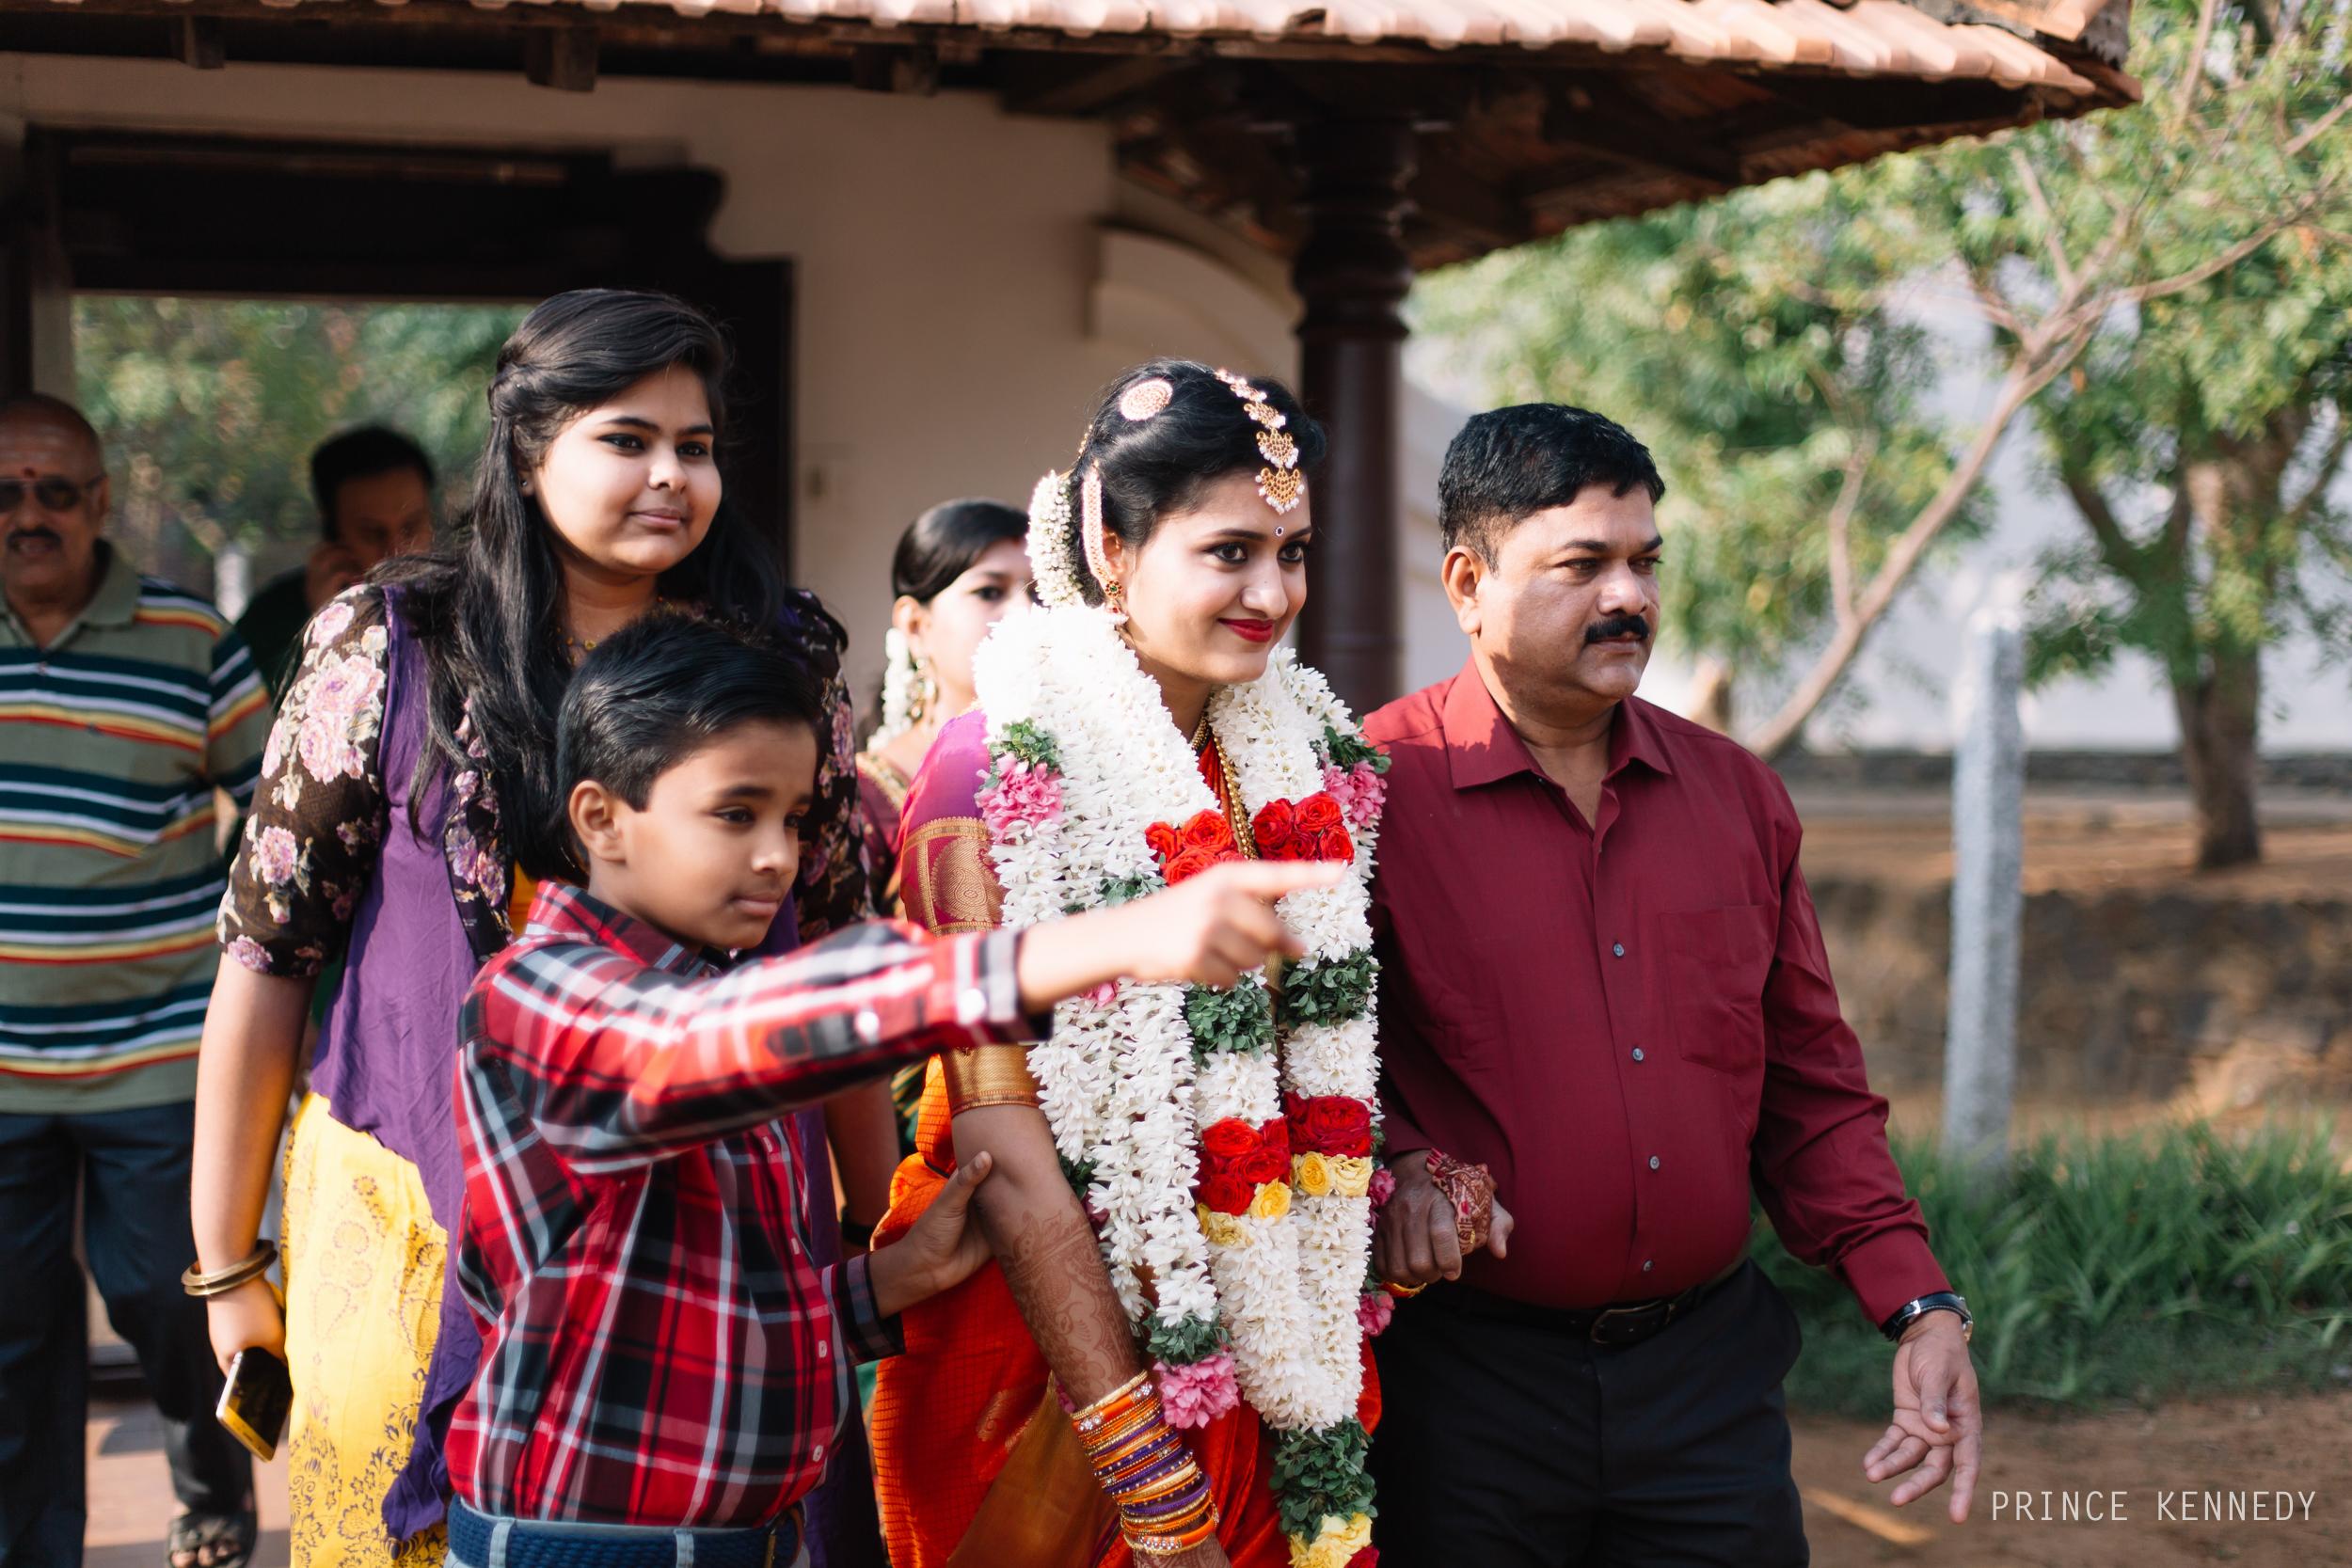 Athmajja-Nithesh-Engagement-Couple-Portrait-Portraiture-Wedding-Couple-Portrait-Chennai-Photographer-Candid-Photography-Destination-Best-Prince-Kennedy-Photography-62.jpg